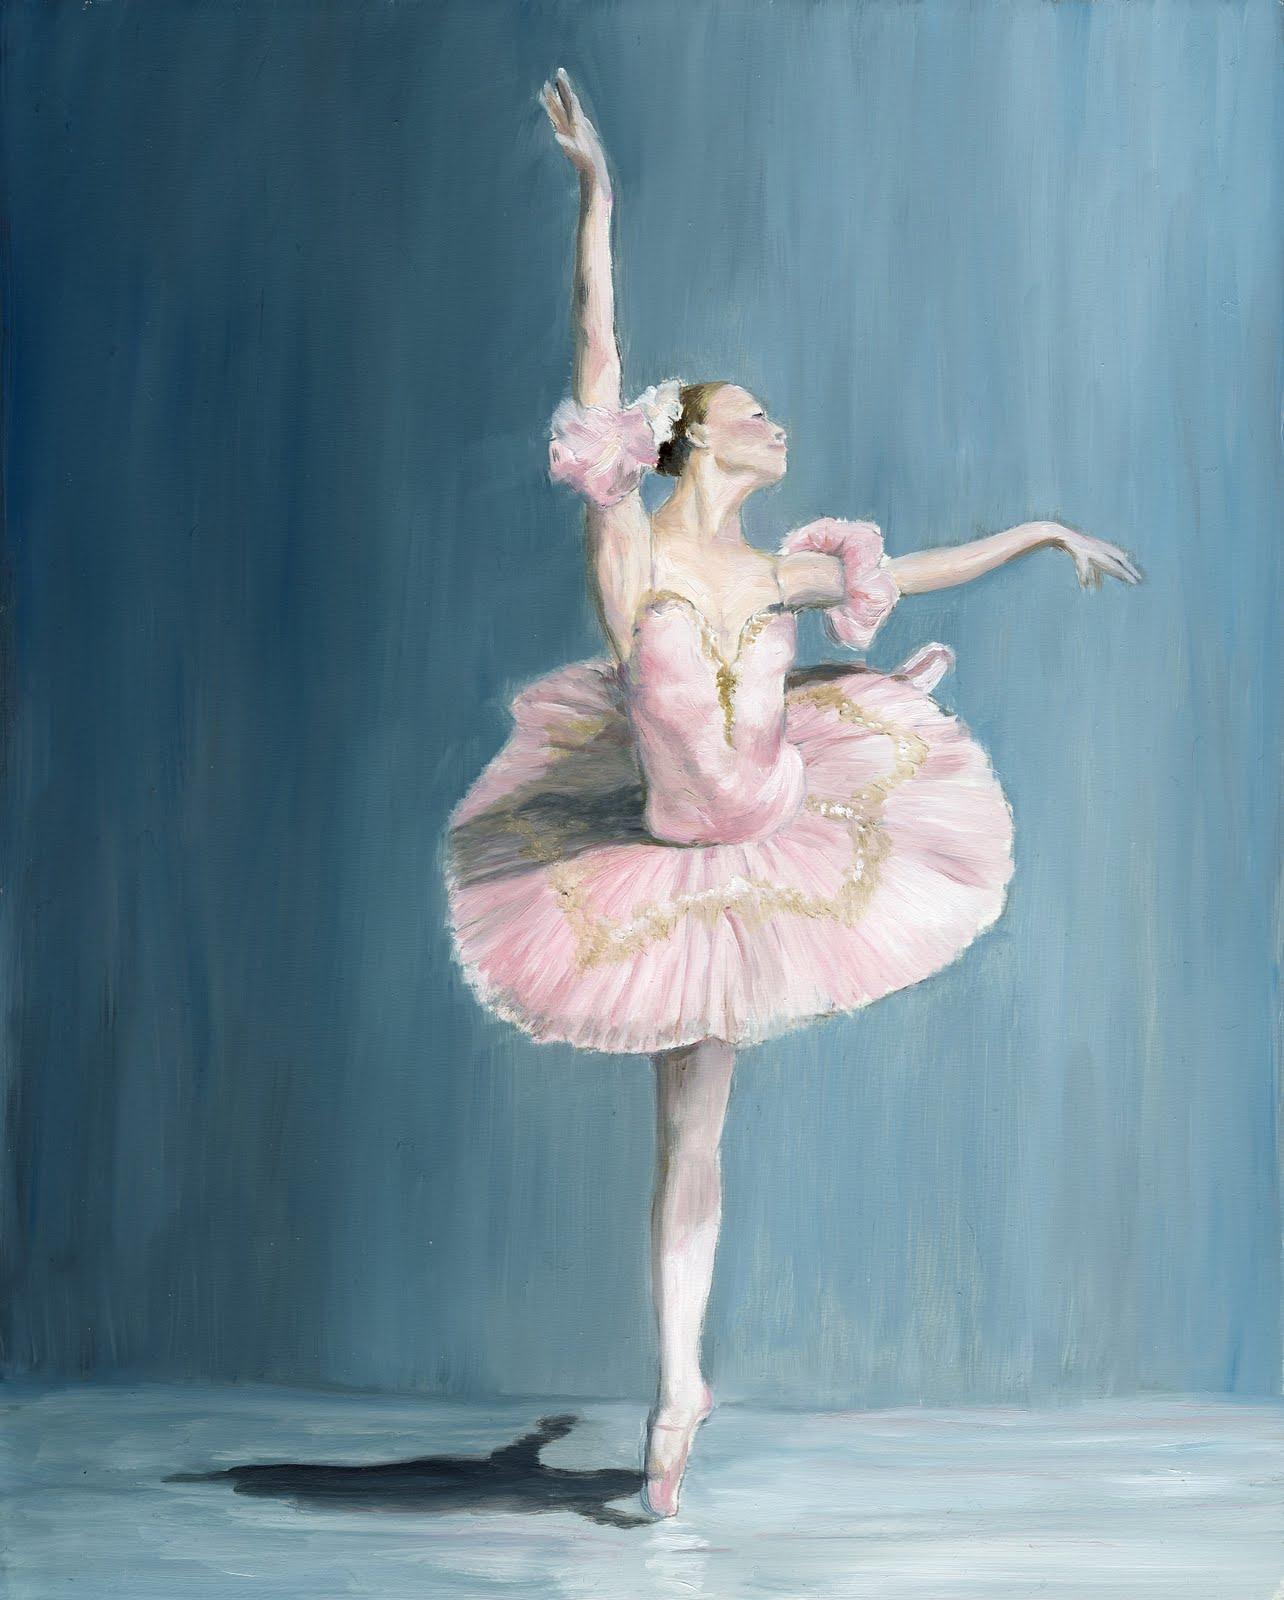 Paintings Of Ballerinas | www.imgkid.com - The Image Kid ...